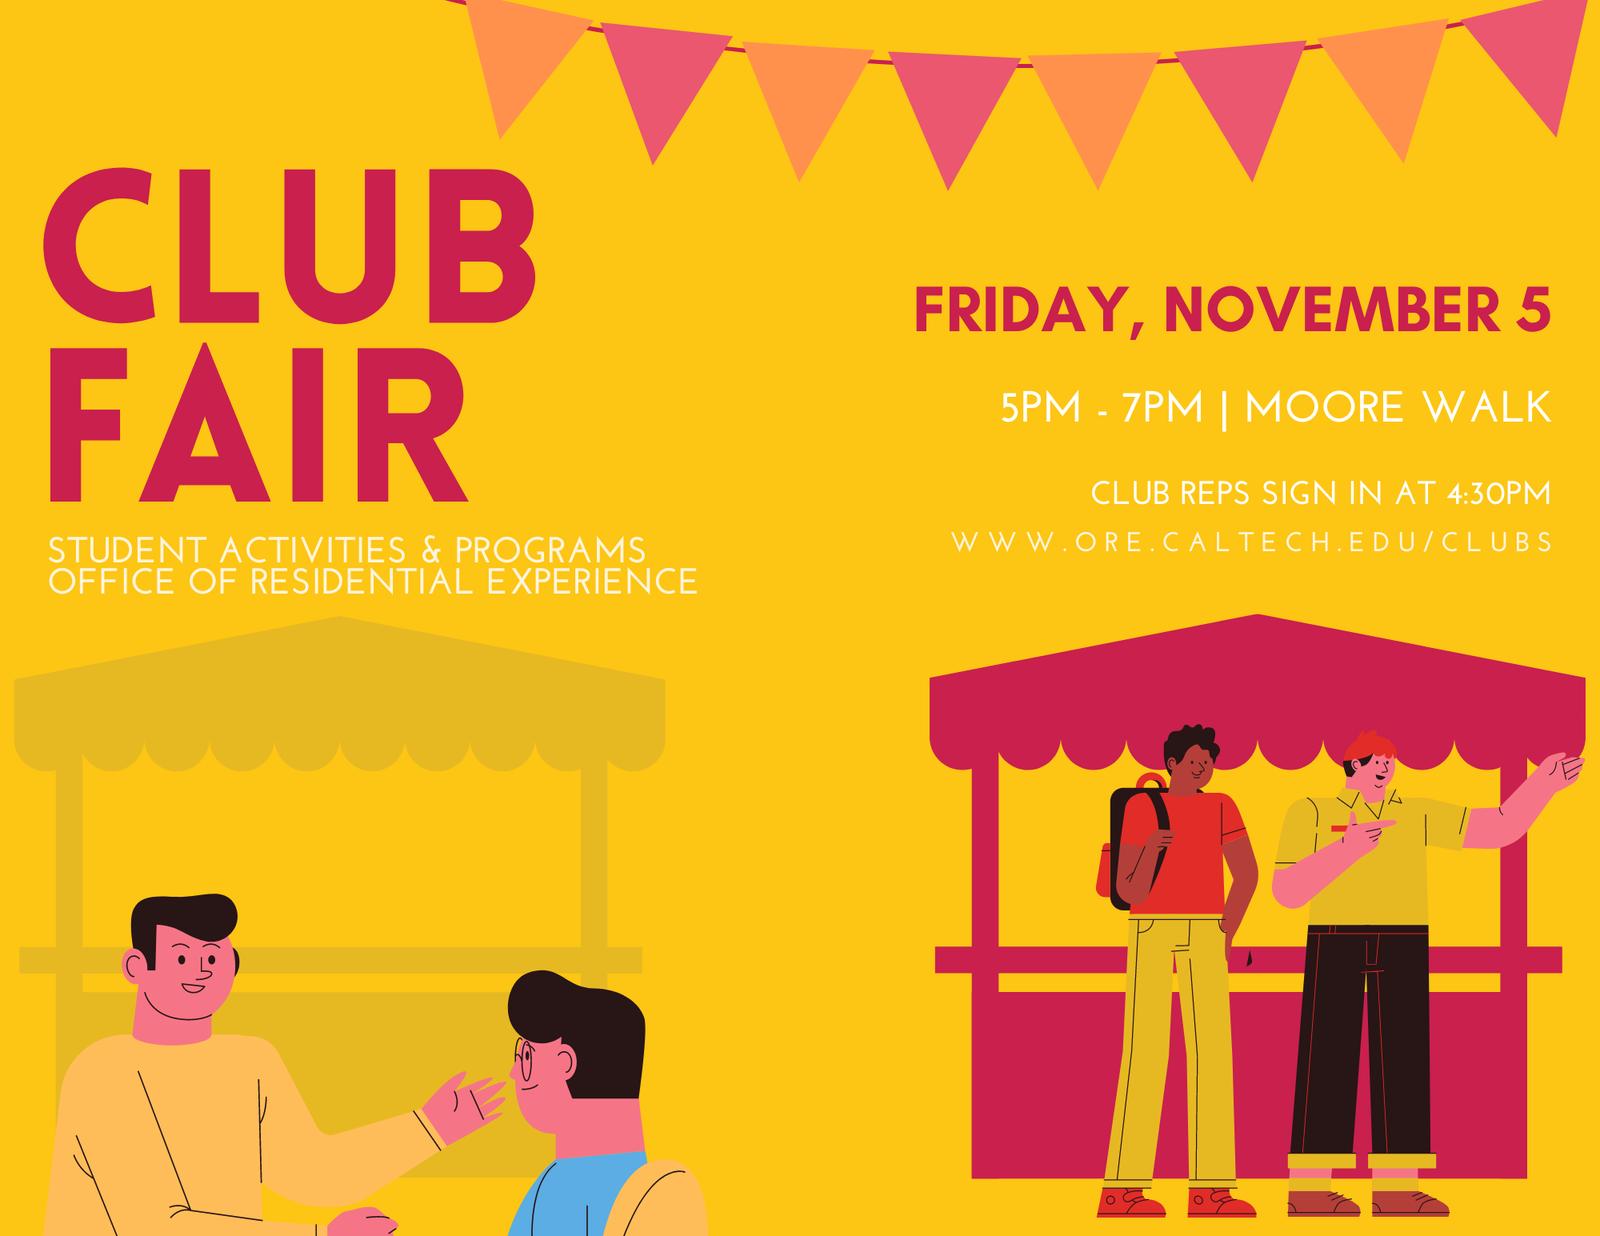 Club Fair Flyer